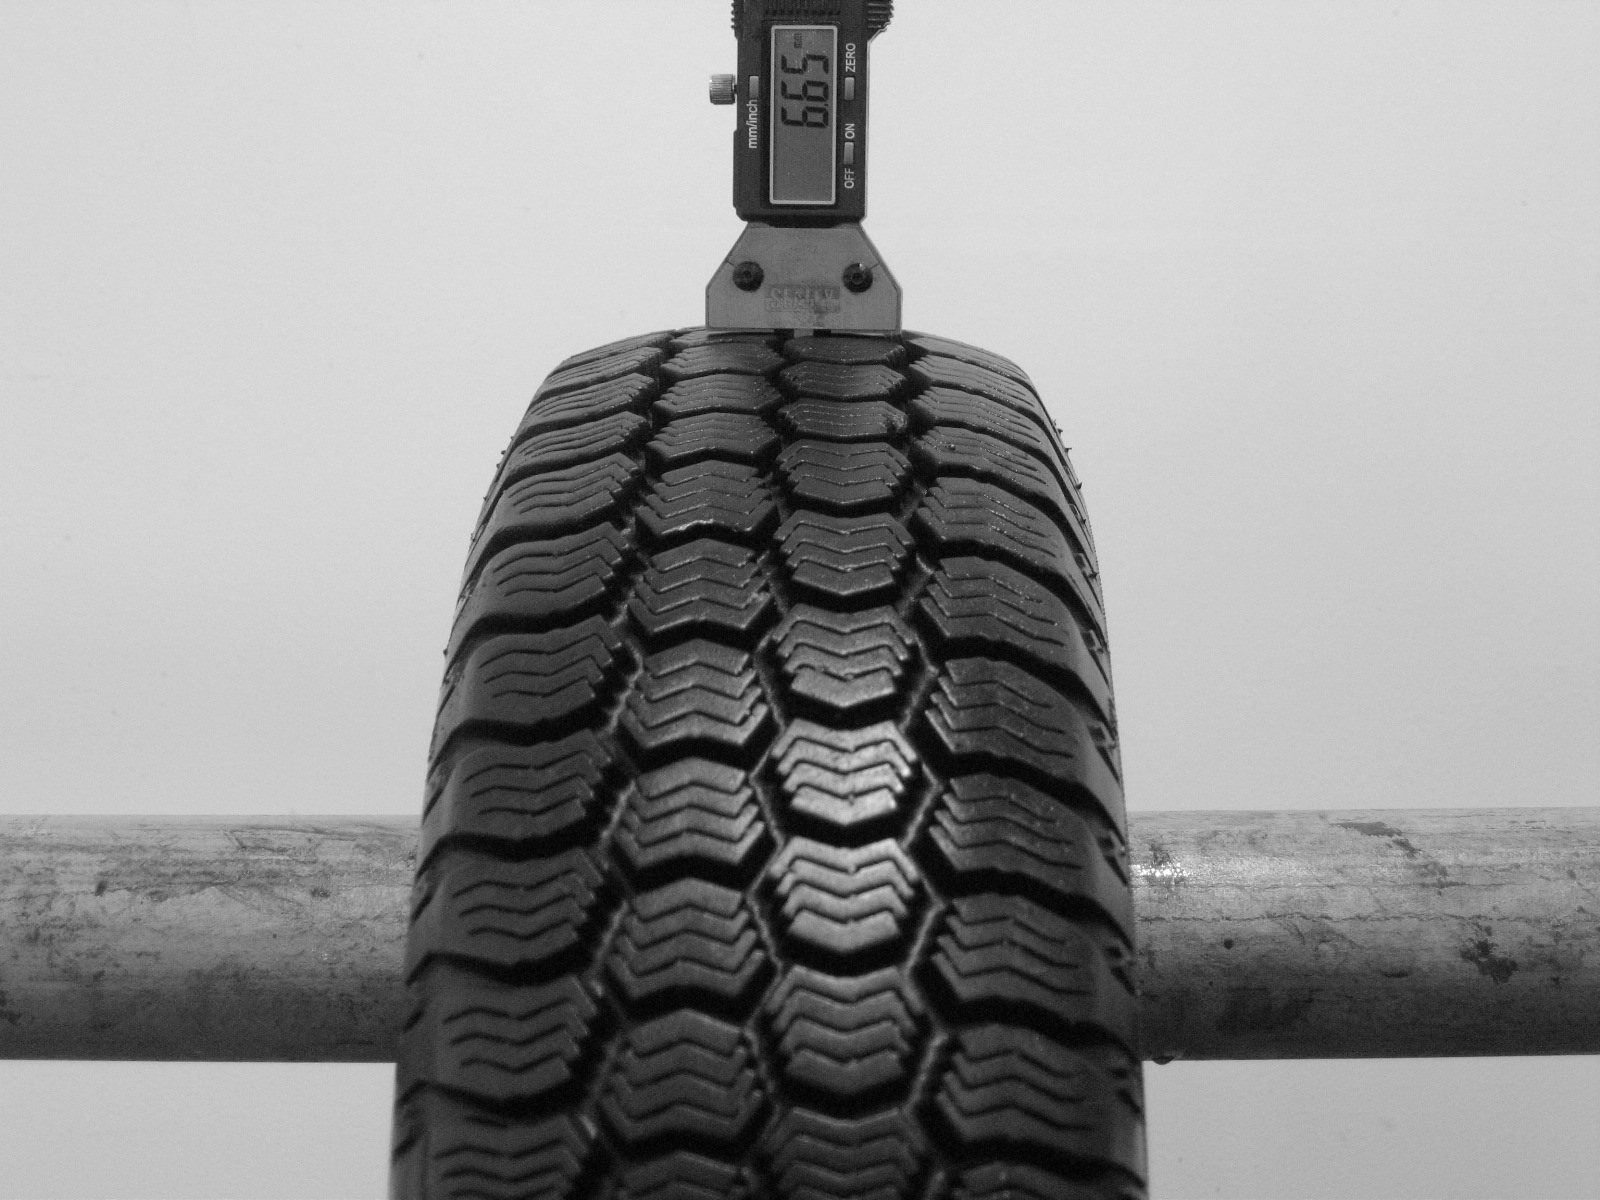 Použité-Pneu-Bazar - 145/80 R13 GOODYEAR ULTRAGRIP 3 -kusovka-rezerva 3mm